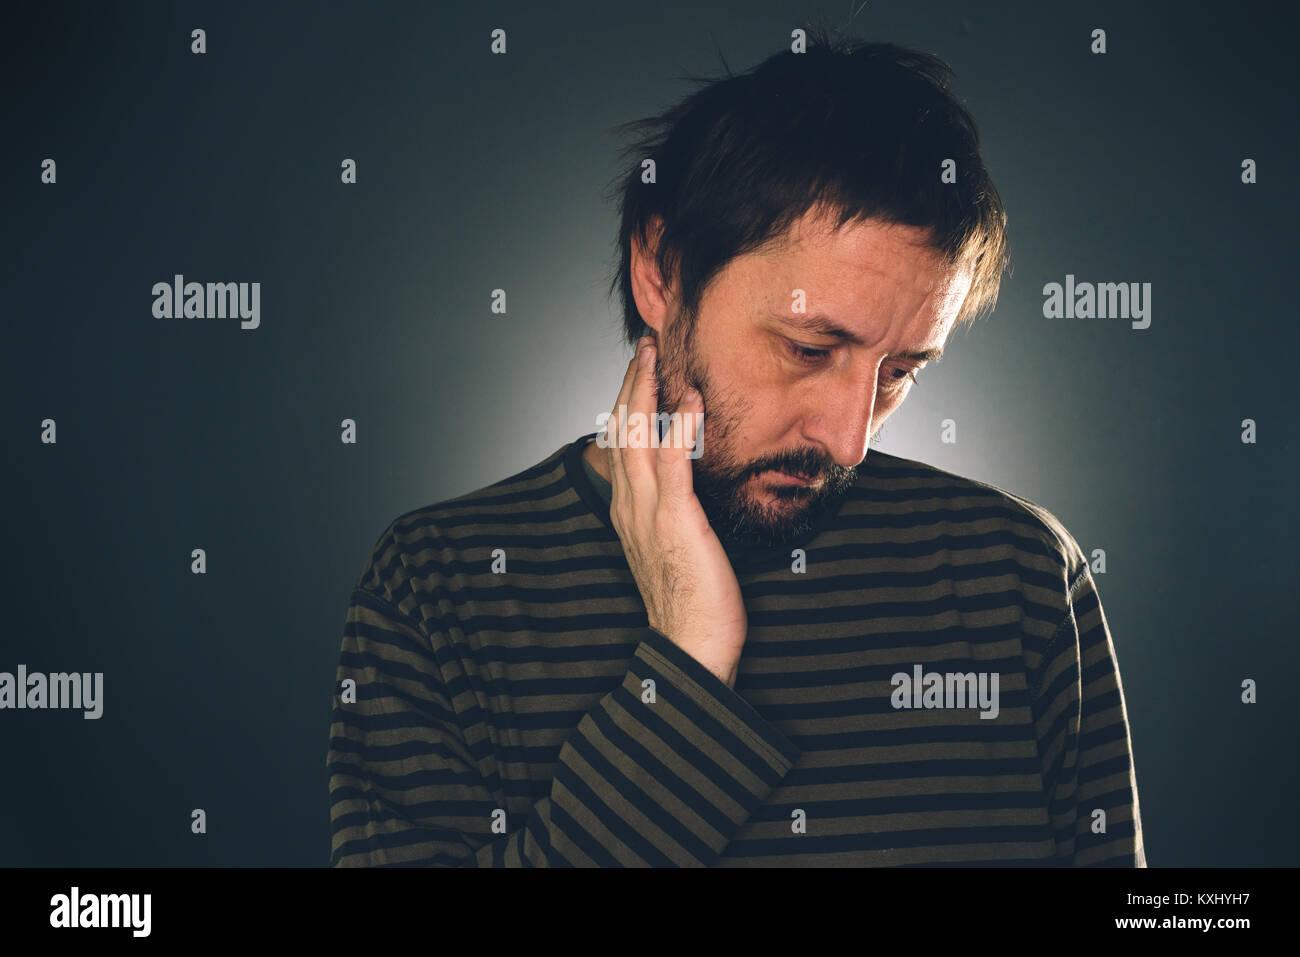 Depressed suicidal man thinking, melancholic adult guy with beard in dark room - Stock Image